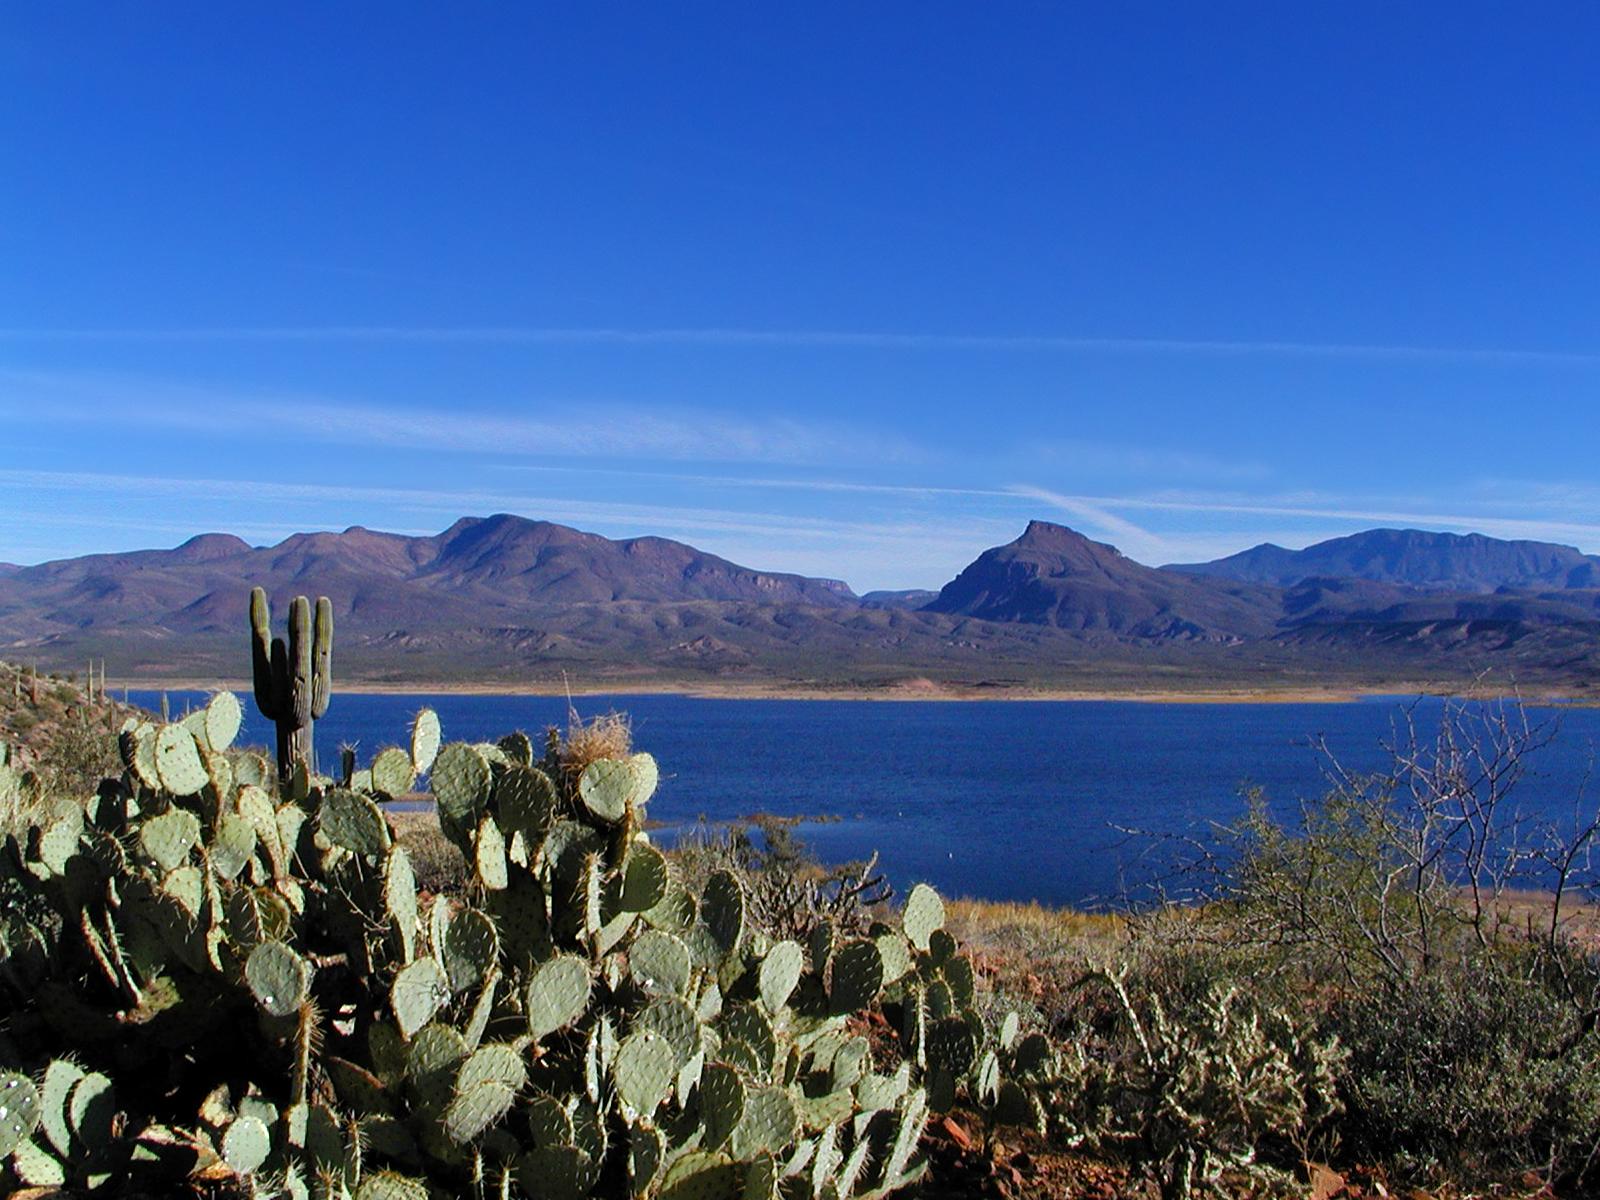 Scenery around a dark blue lake surface.